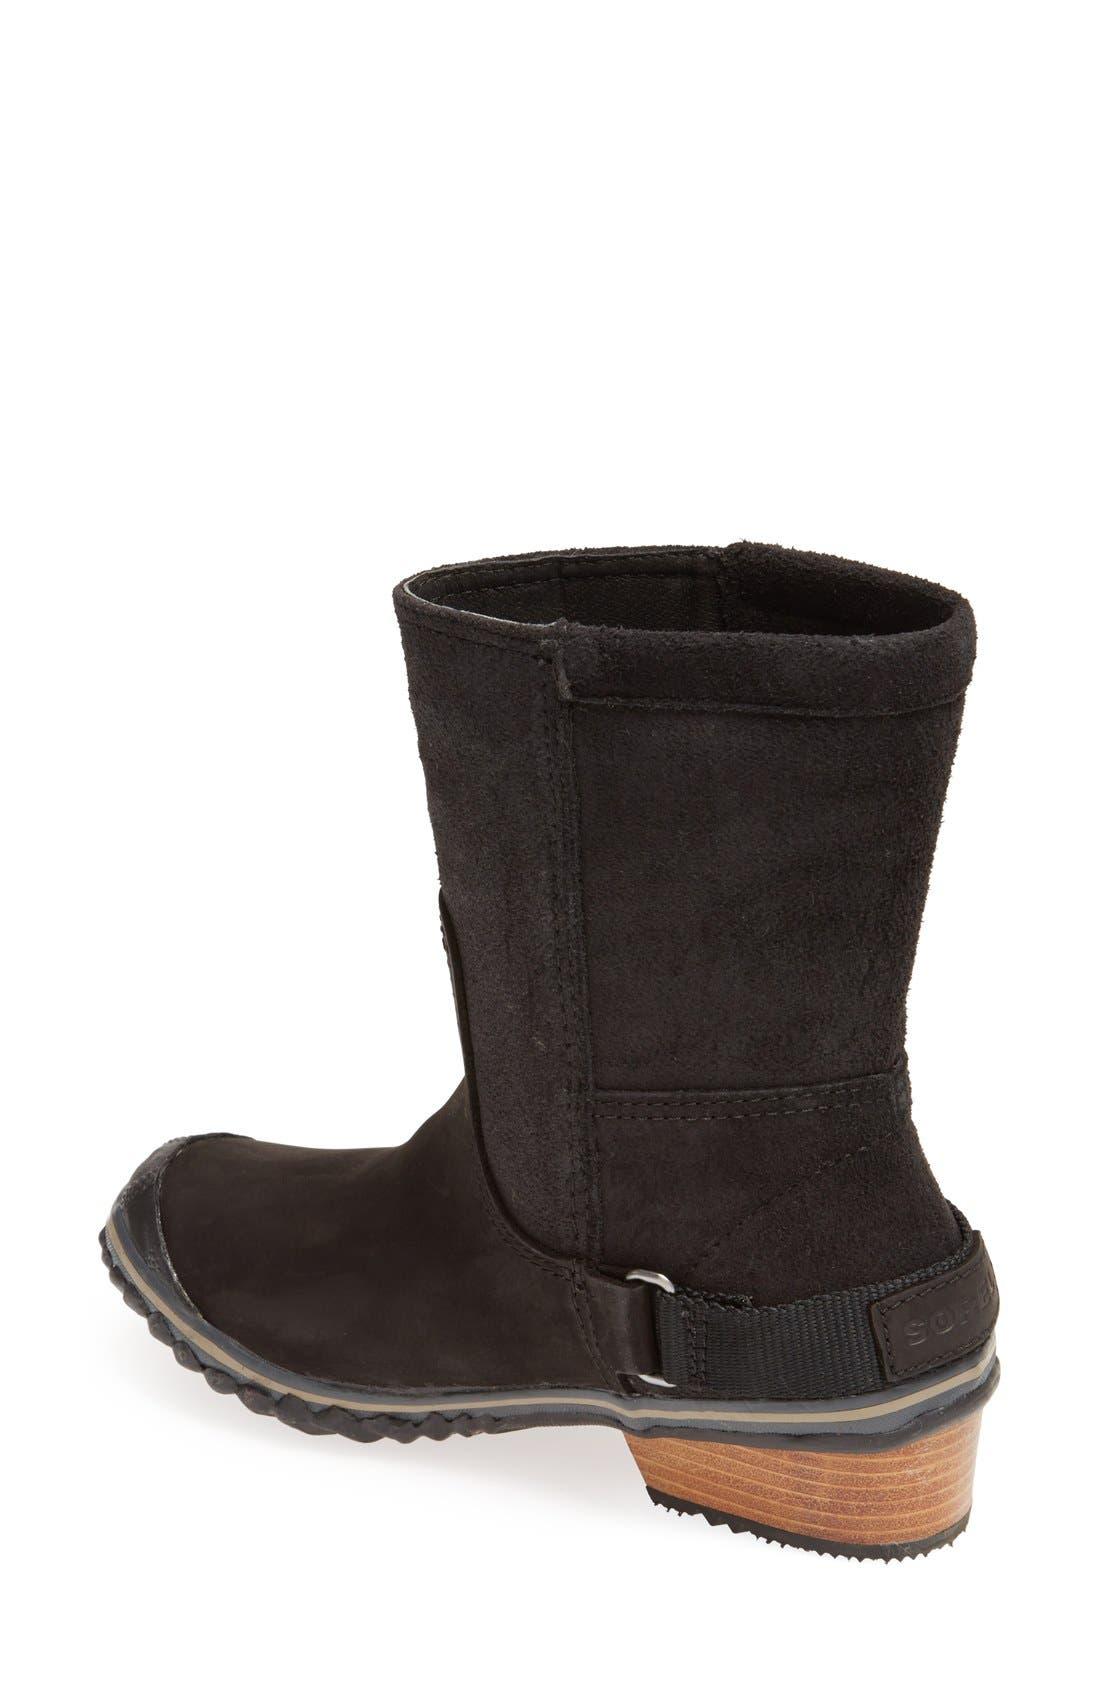 Alternate Image 2  - SOREL 'Slimshortie™' Waterproof Boot (Women)